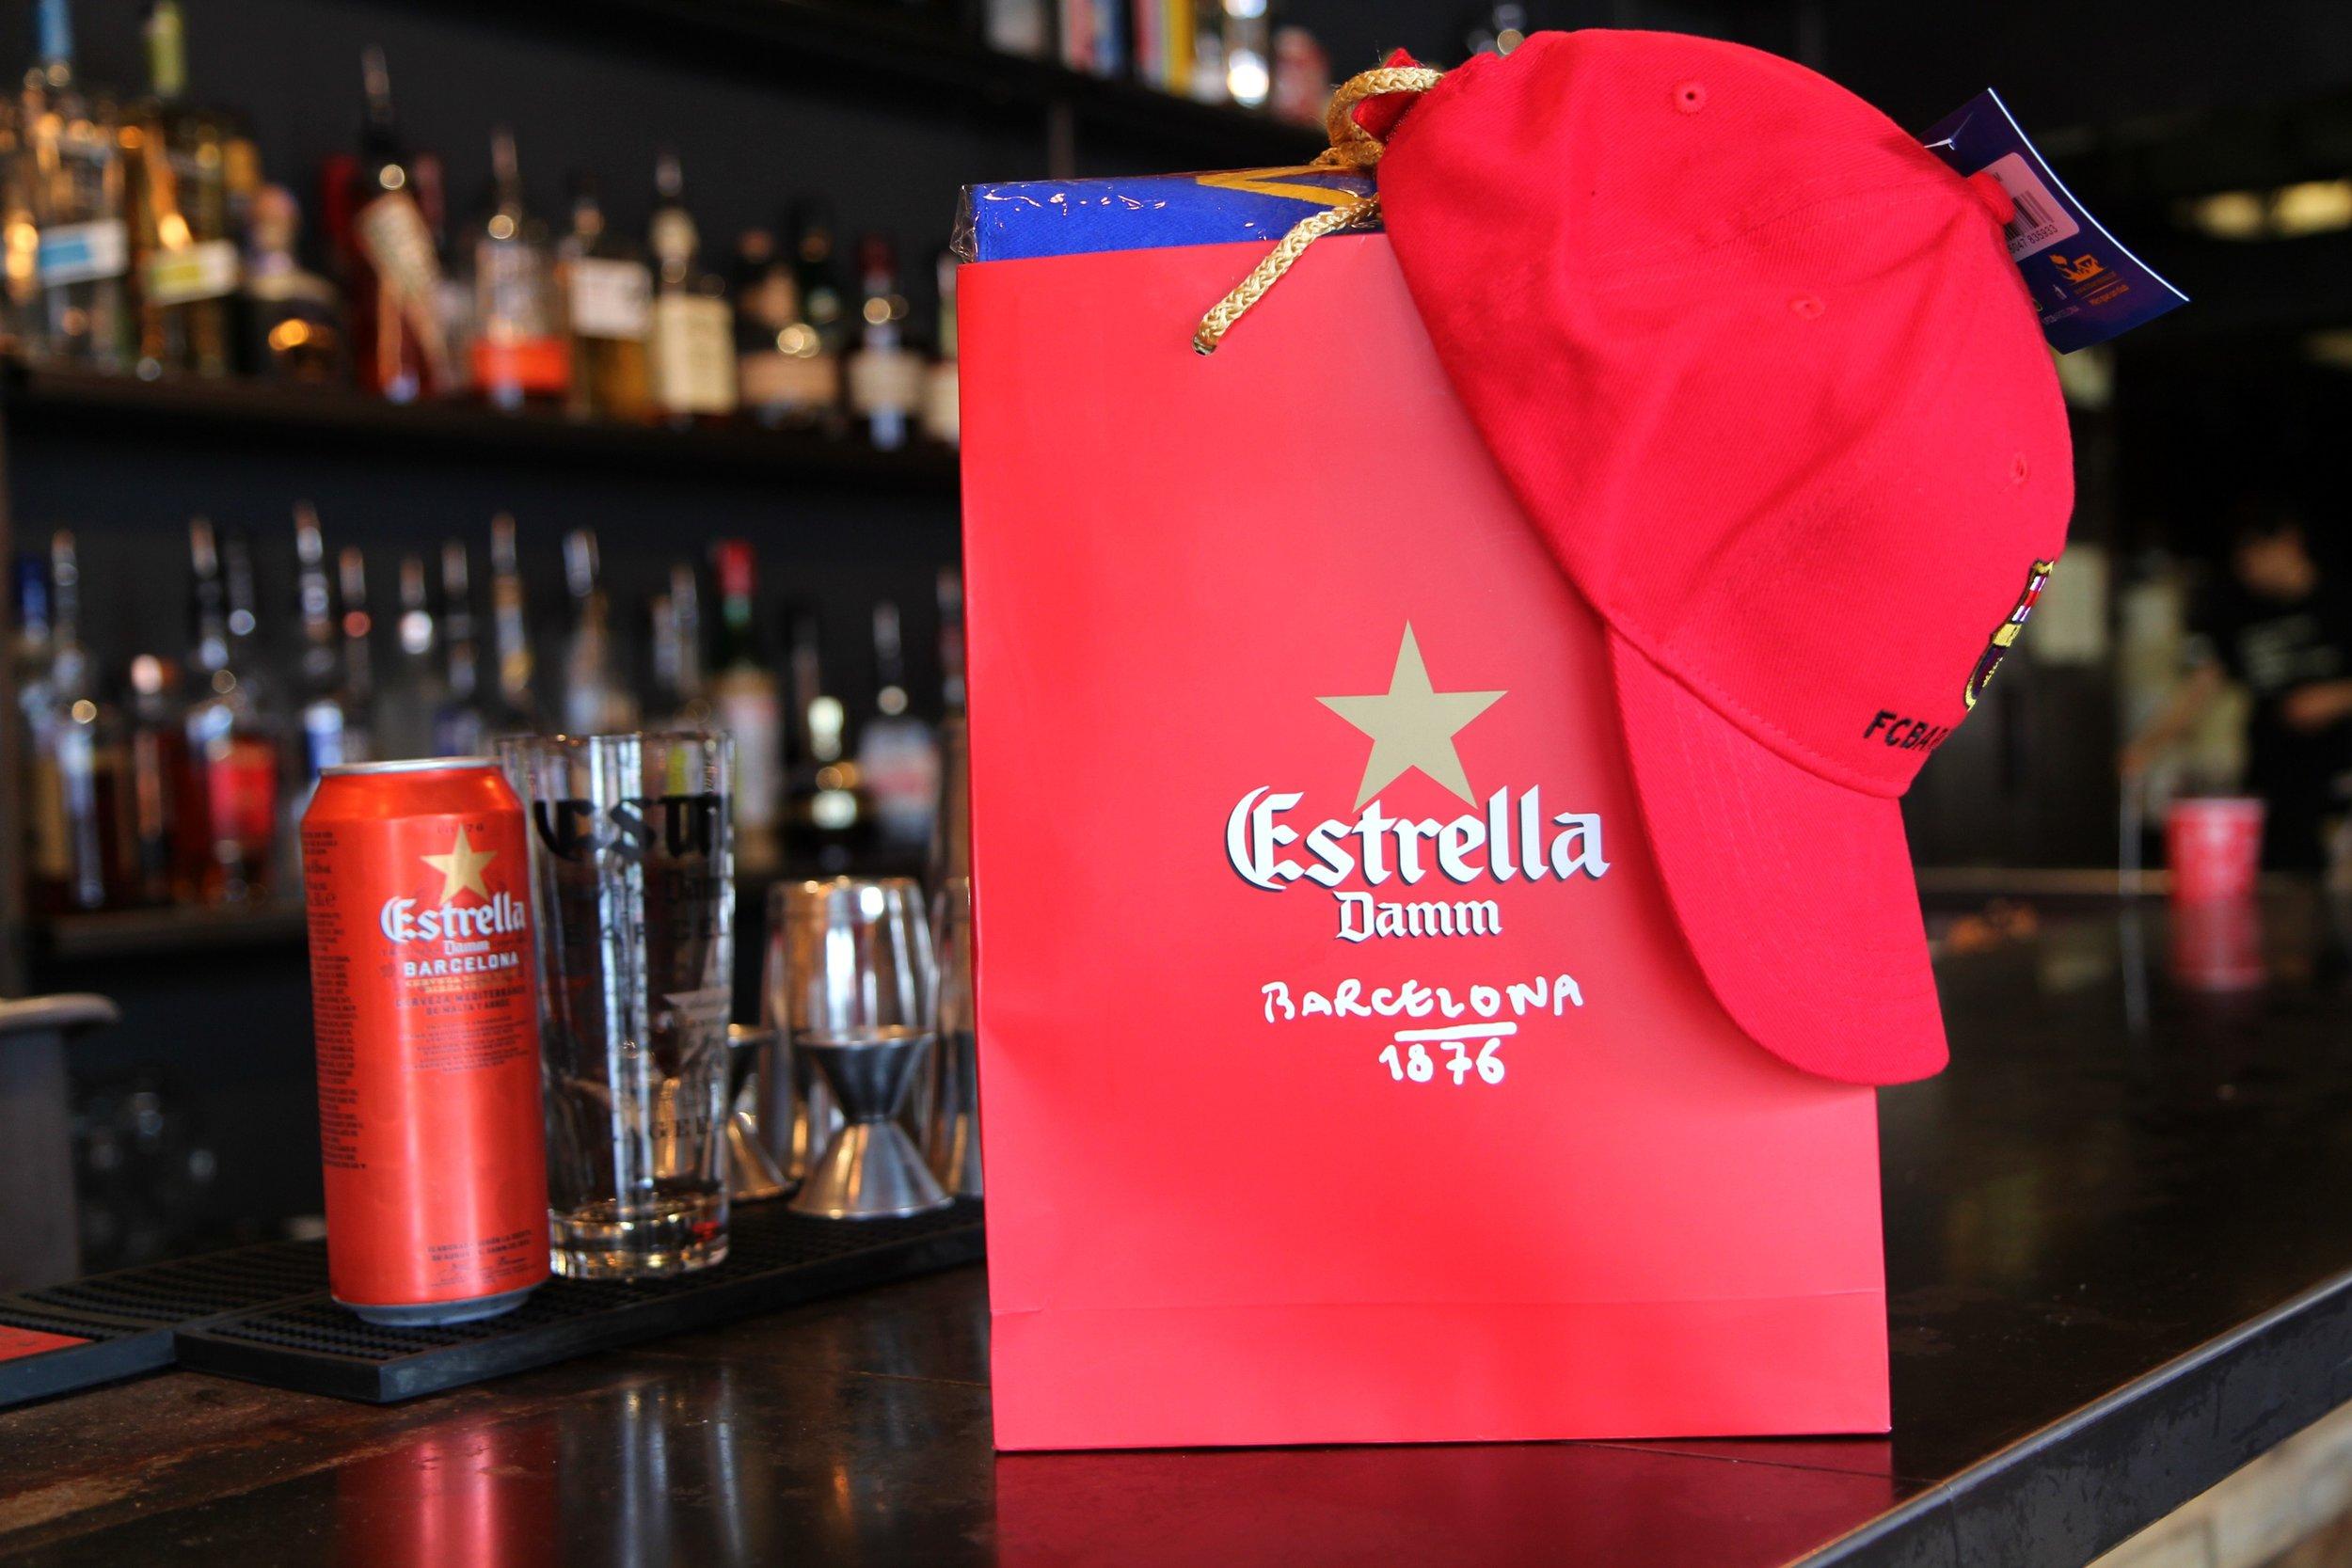 Estrella_Prize.jpg